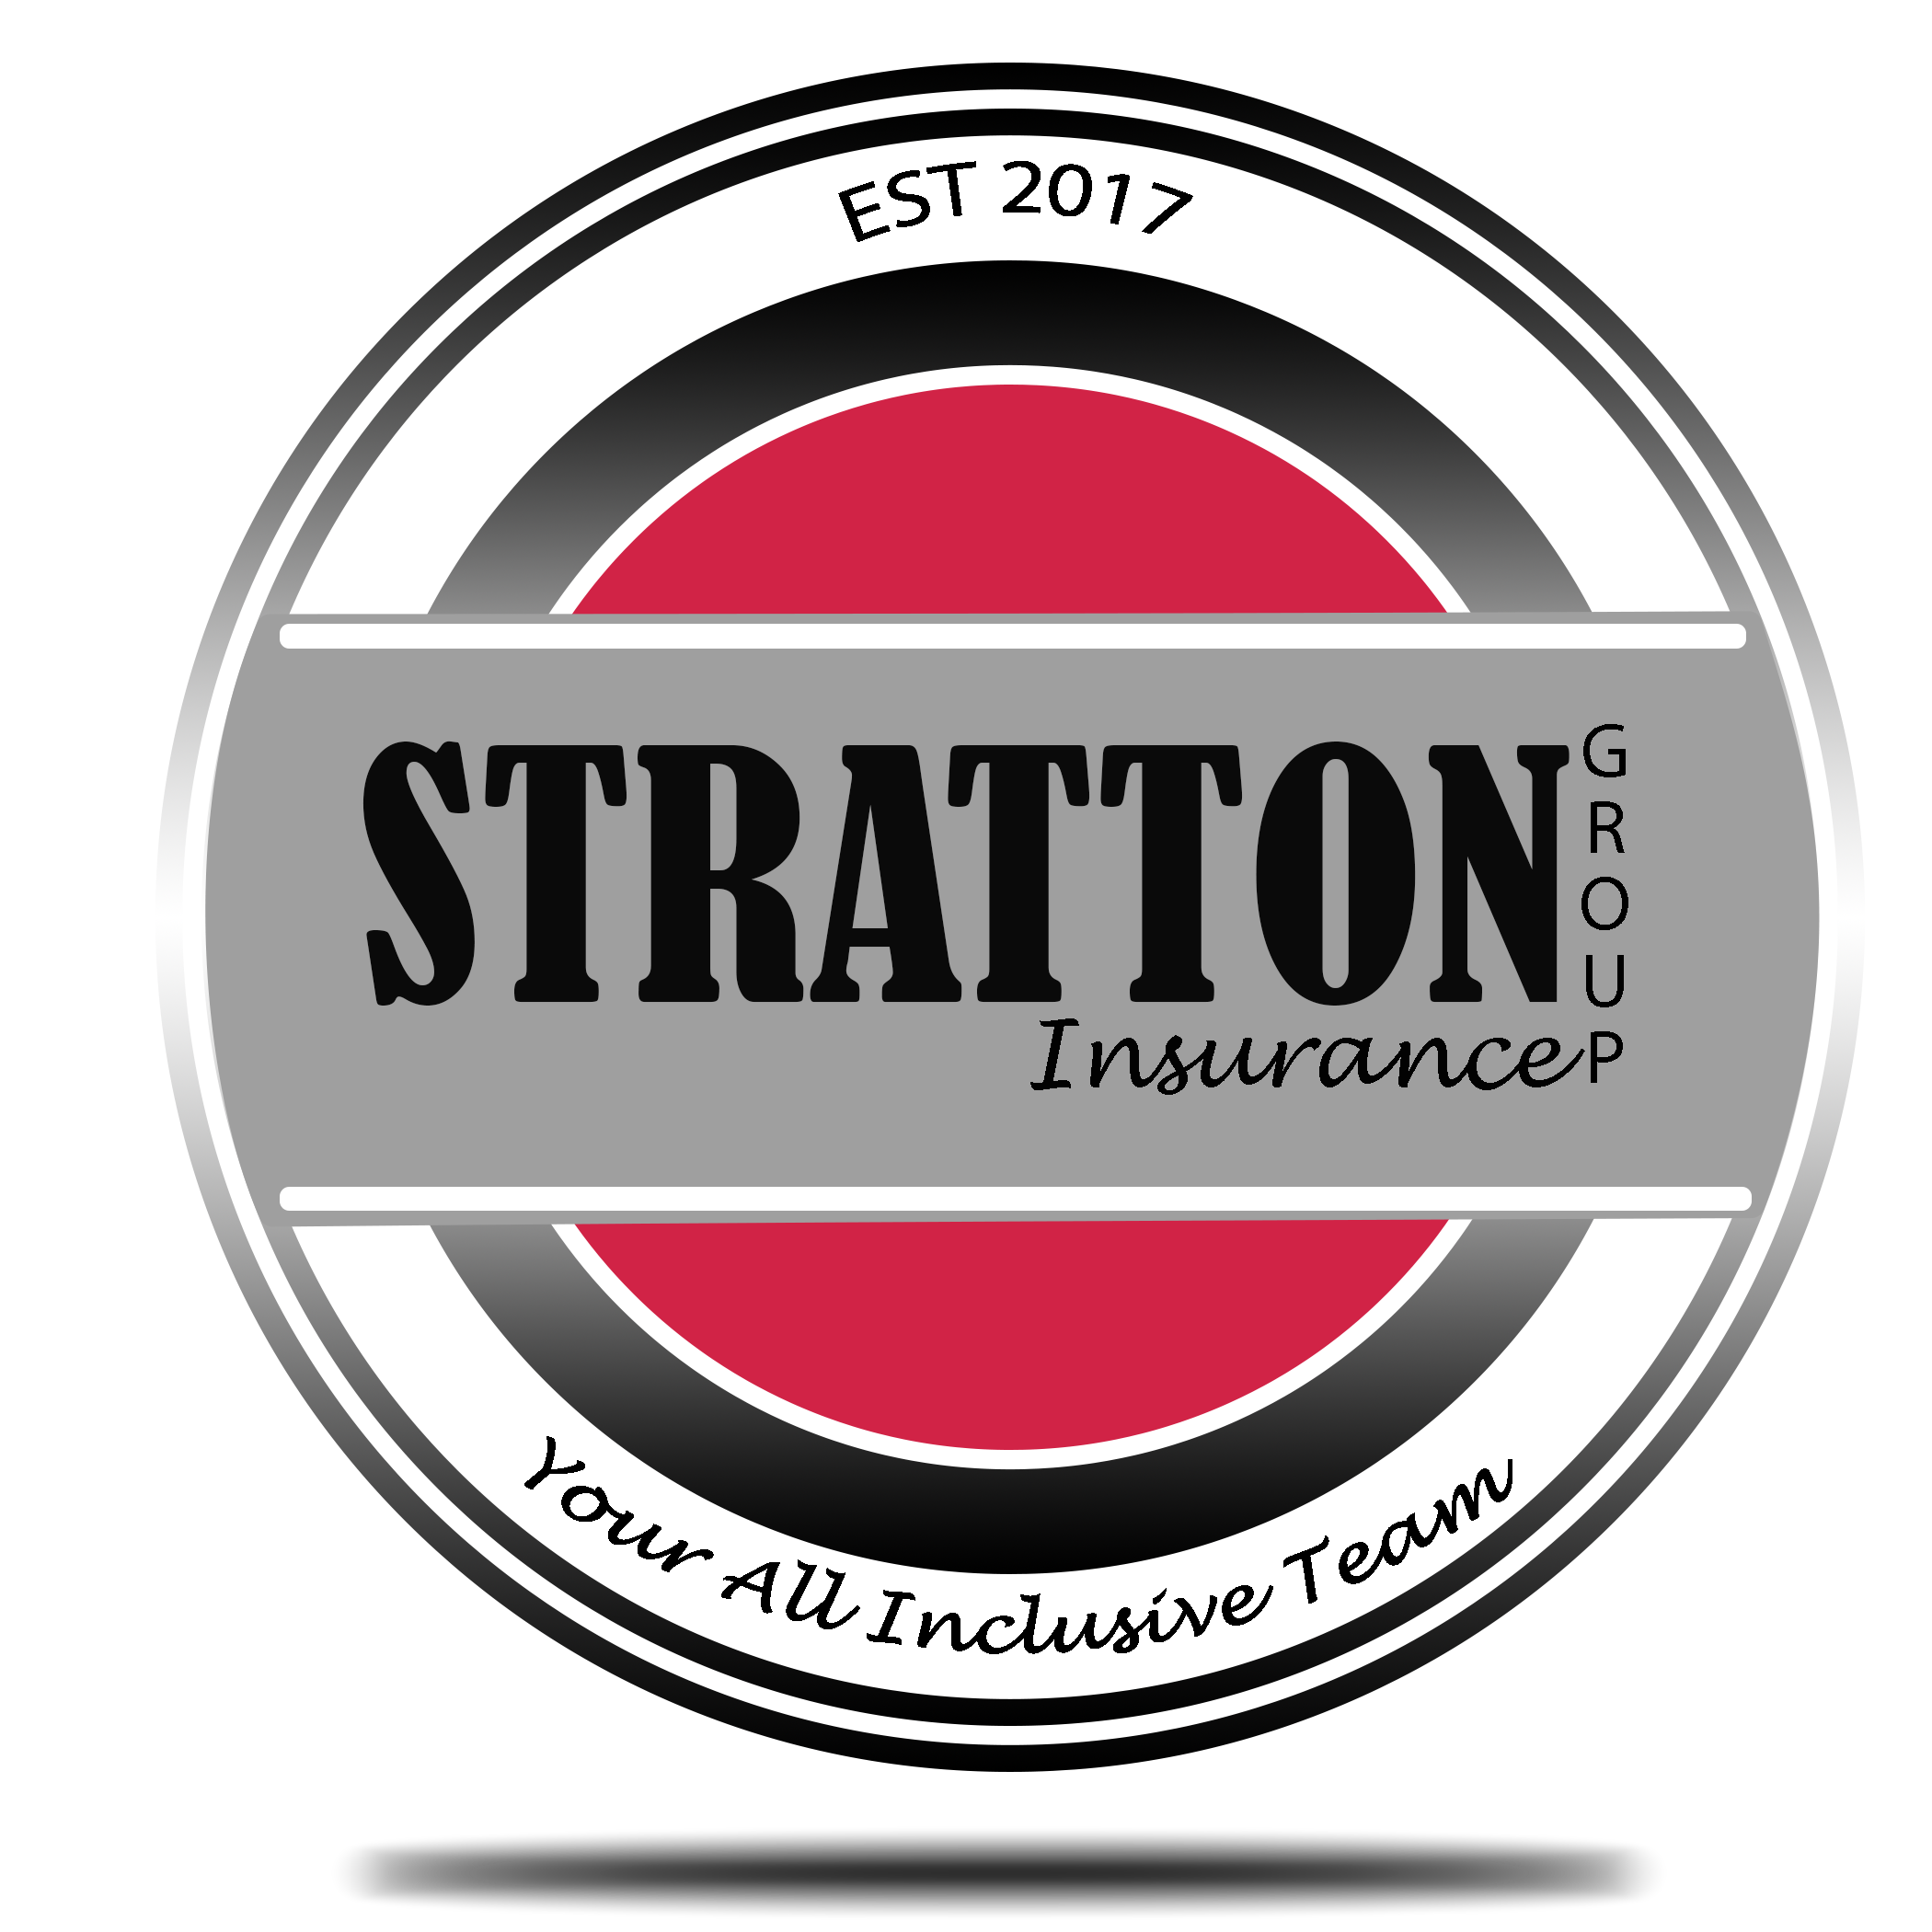 Stratton Insurance logo